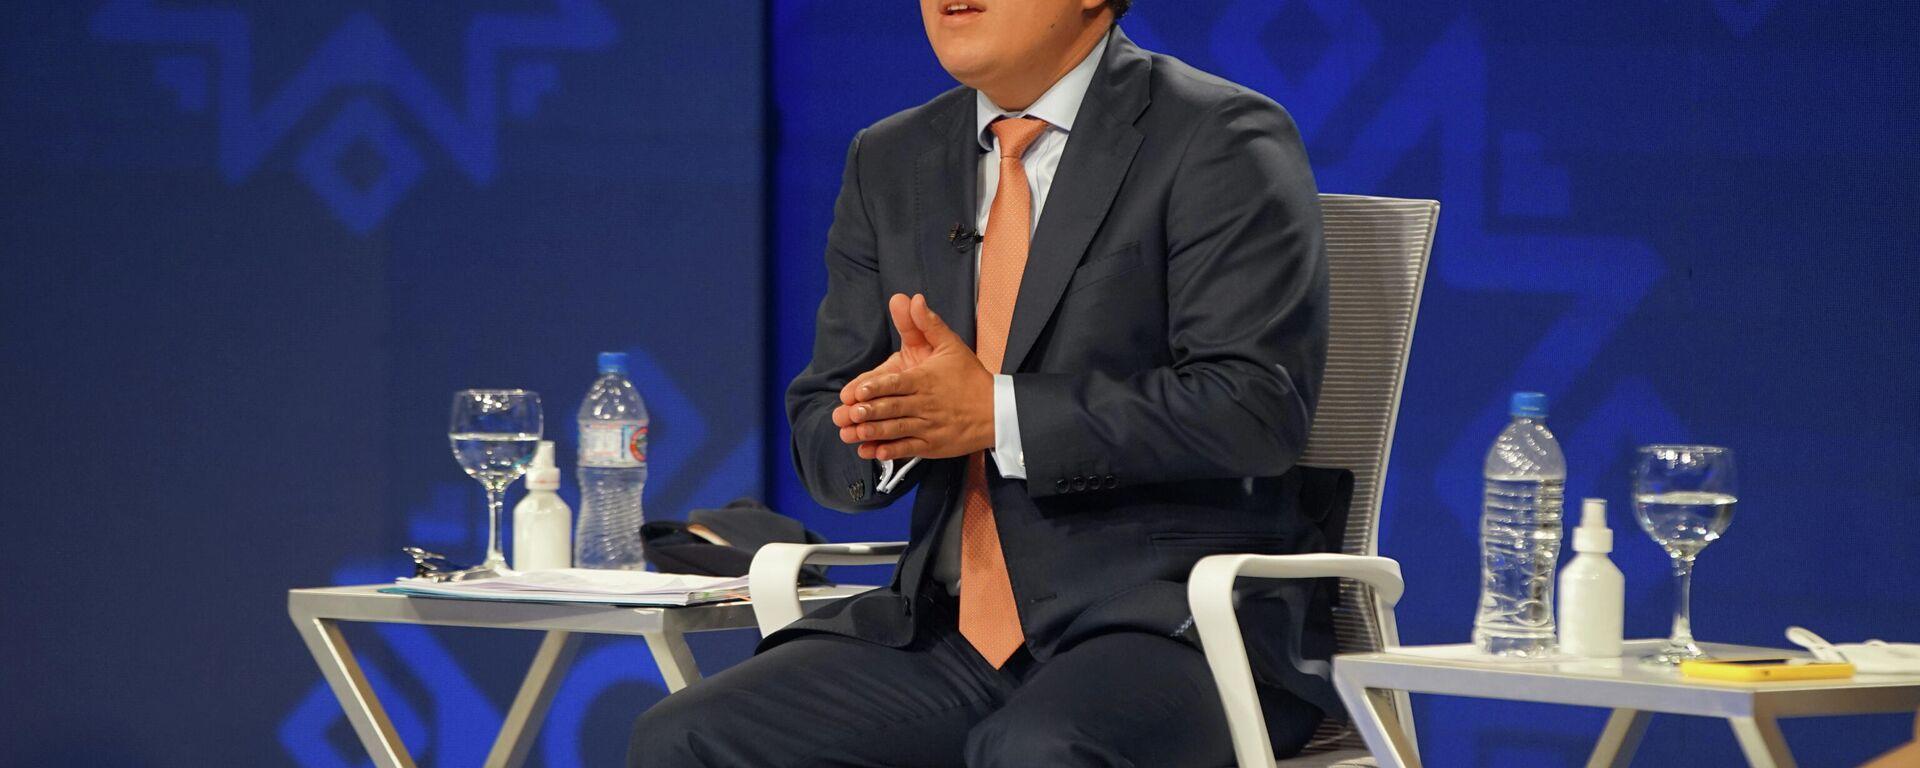 Andrés Arauz, candidato presidencial ecuatoriano por UNES - Sputnik Mundo, 1920, 27.02.2021